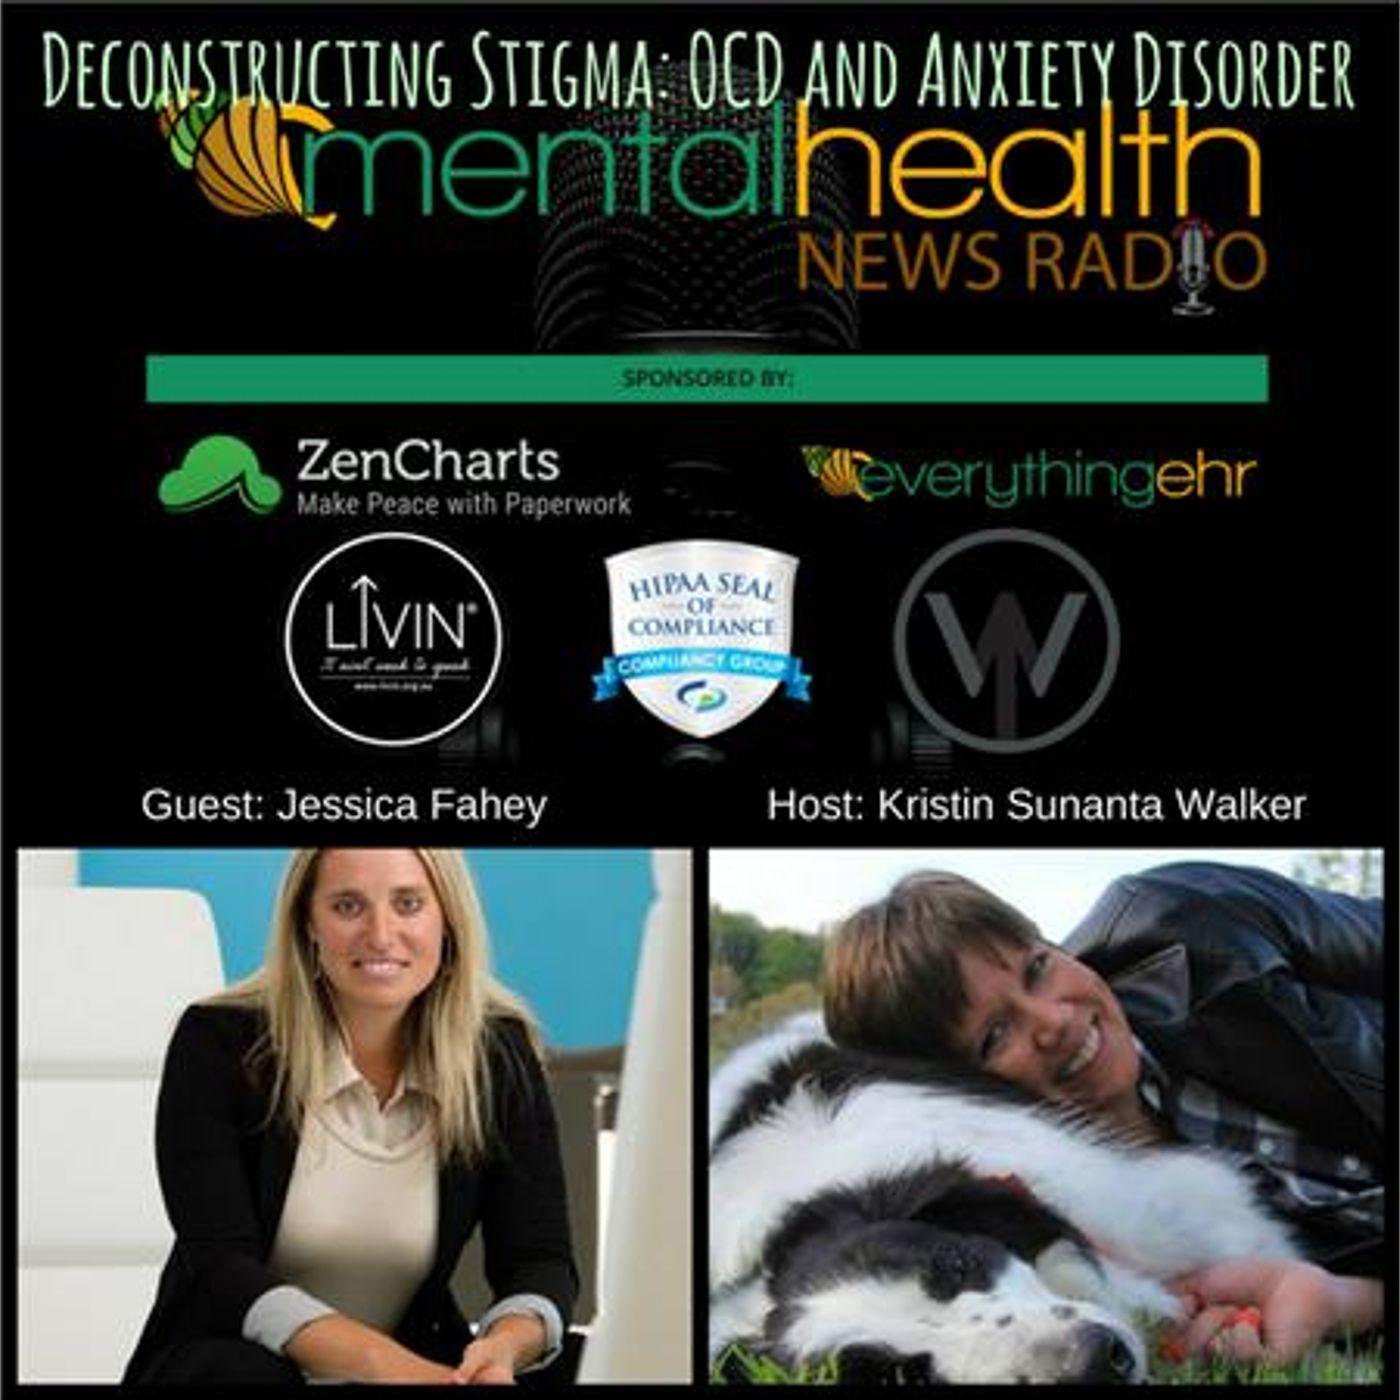 Mental Health News Radio - Deconstructing Stigma: OCD and Anxiety Disorder with Jessica Fahey